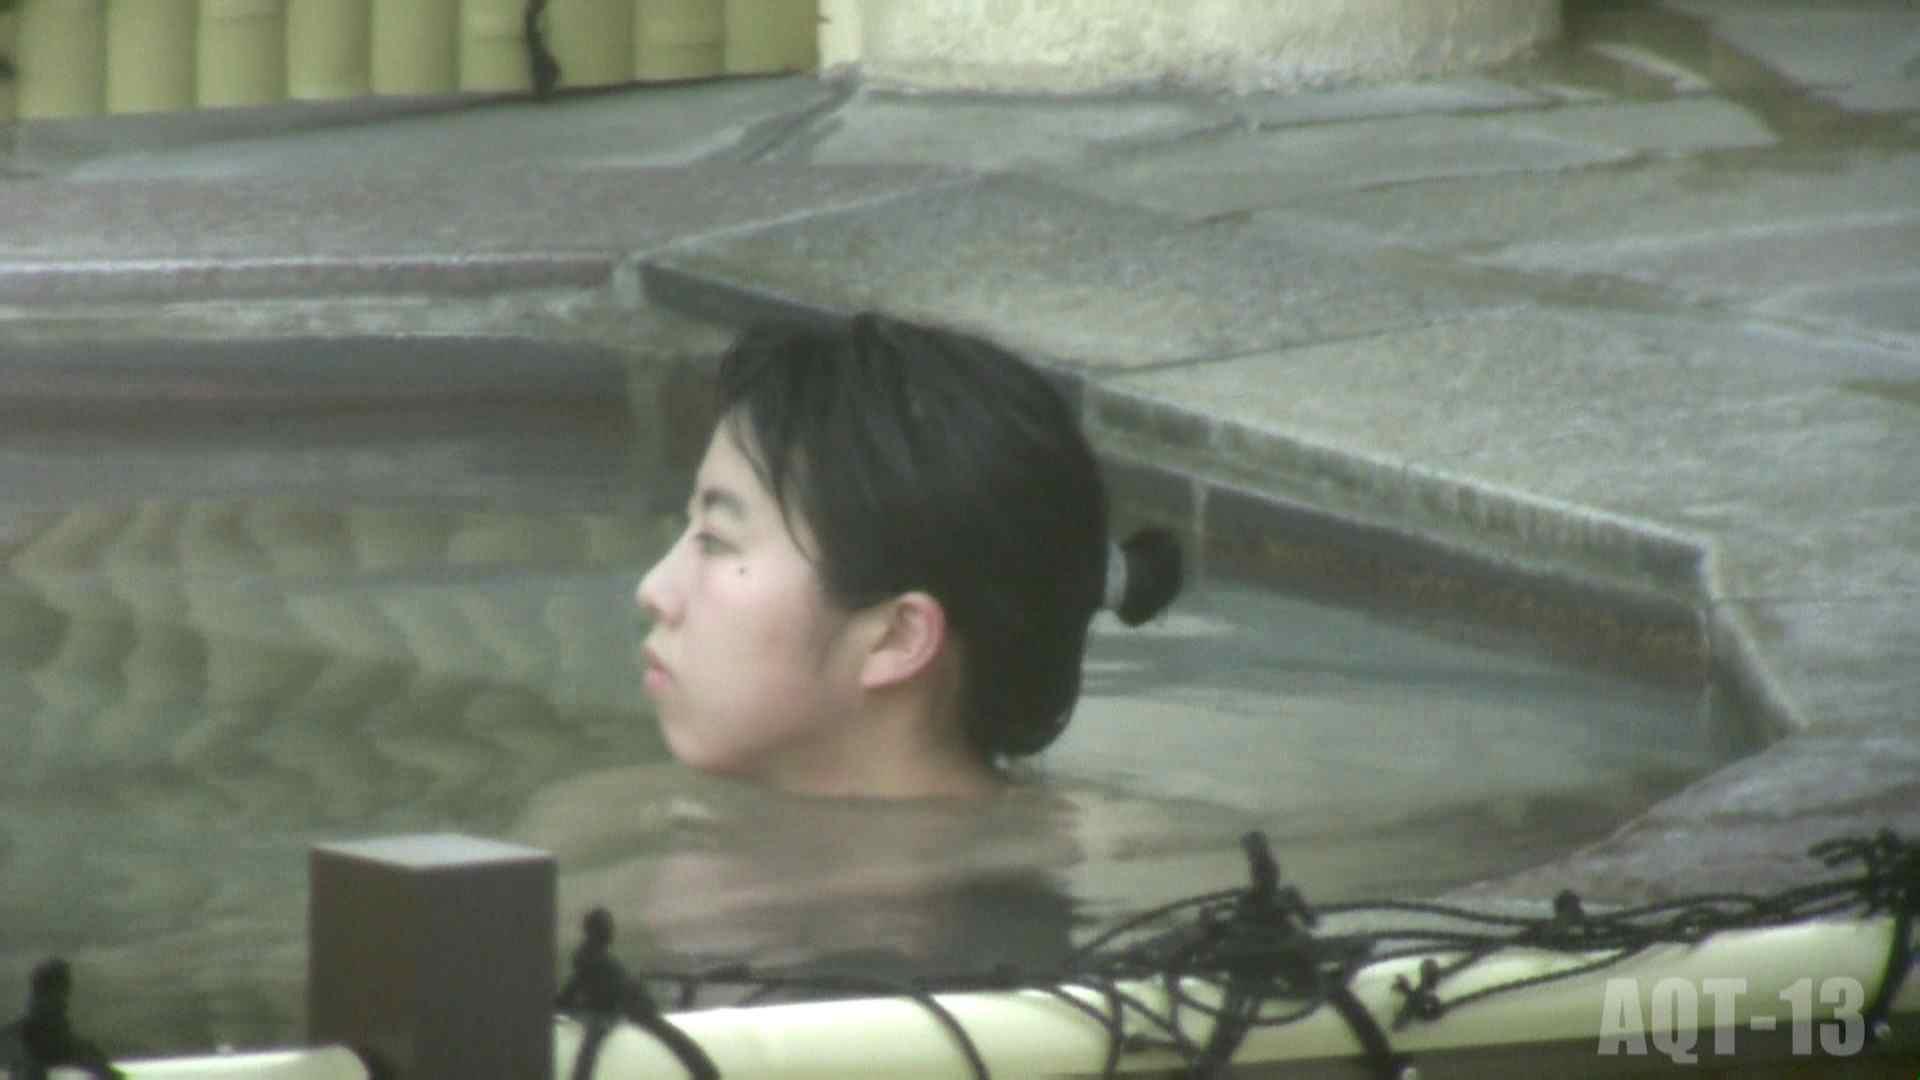 Aquaな露天風呂Vol.816 盗撮   OLエロ画像  105PICs 37